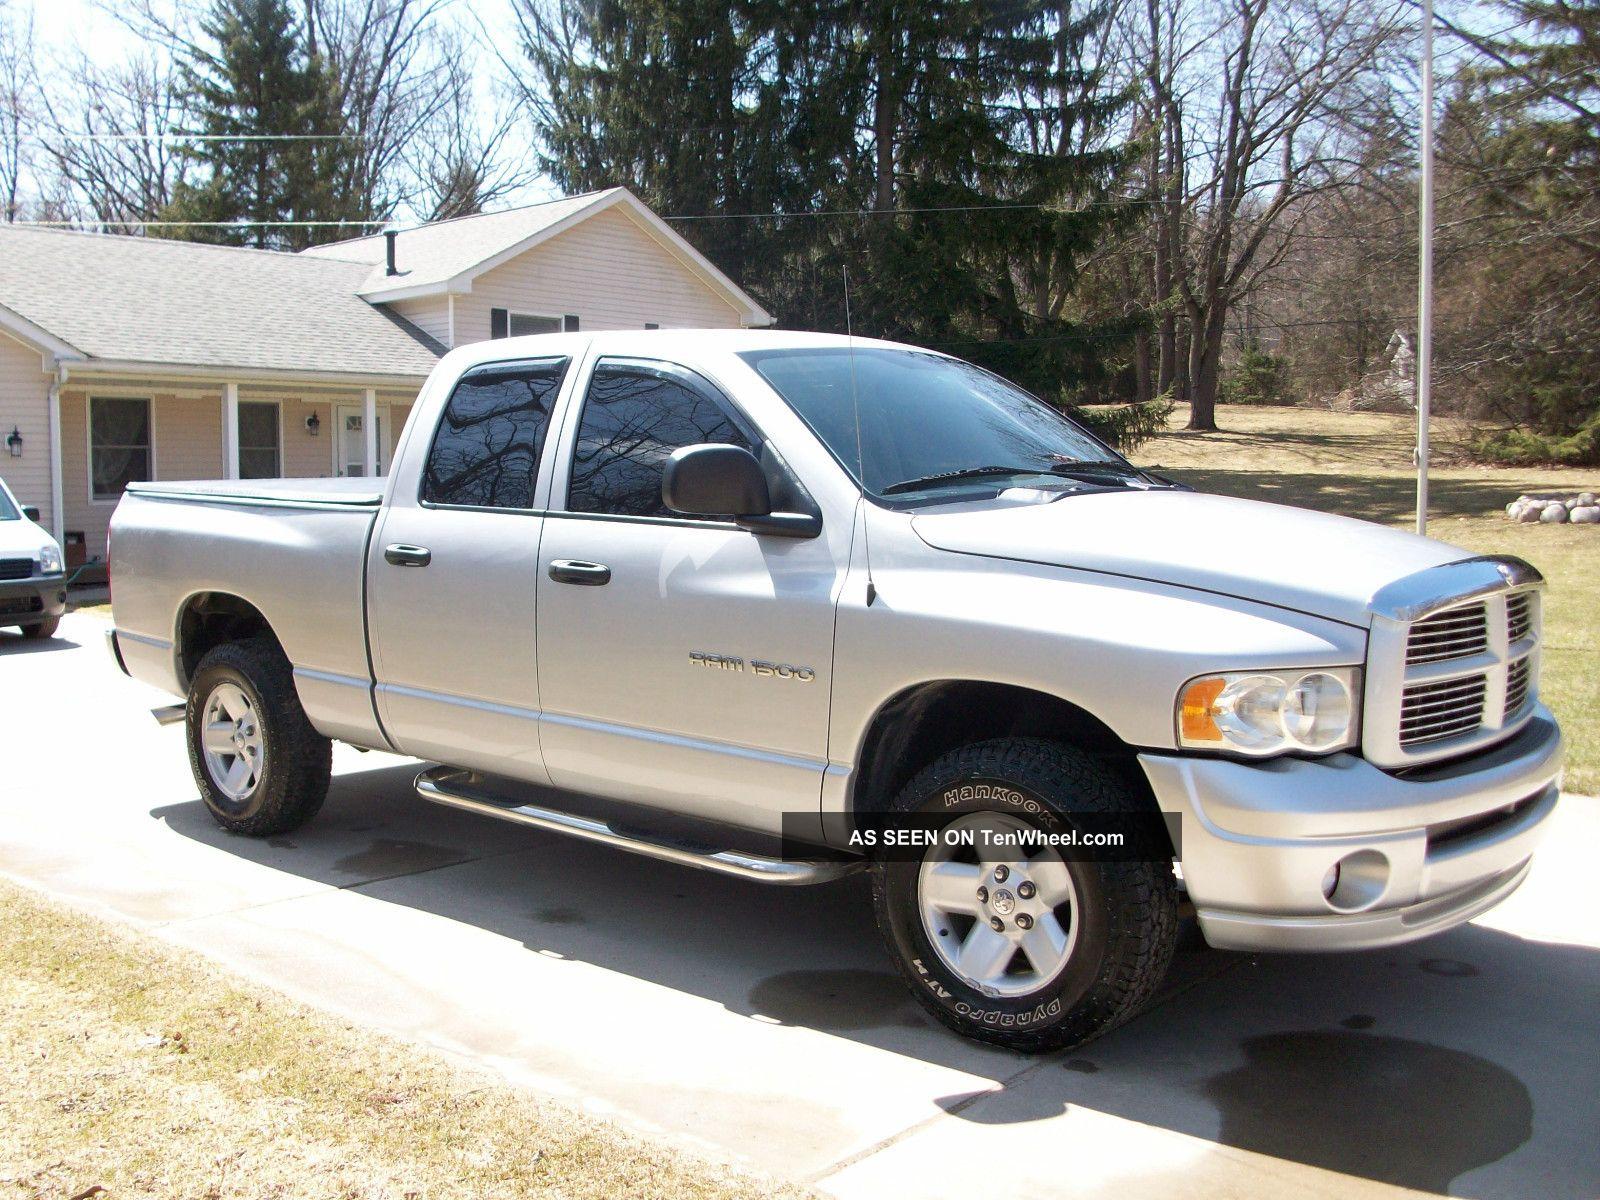 2003 Dodge Ram 1500 Slt Crew Cab Pickup 4